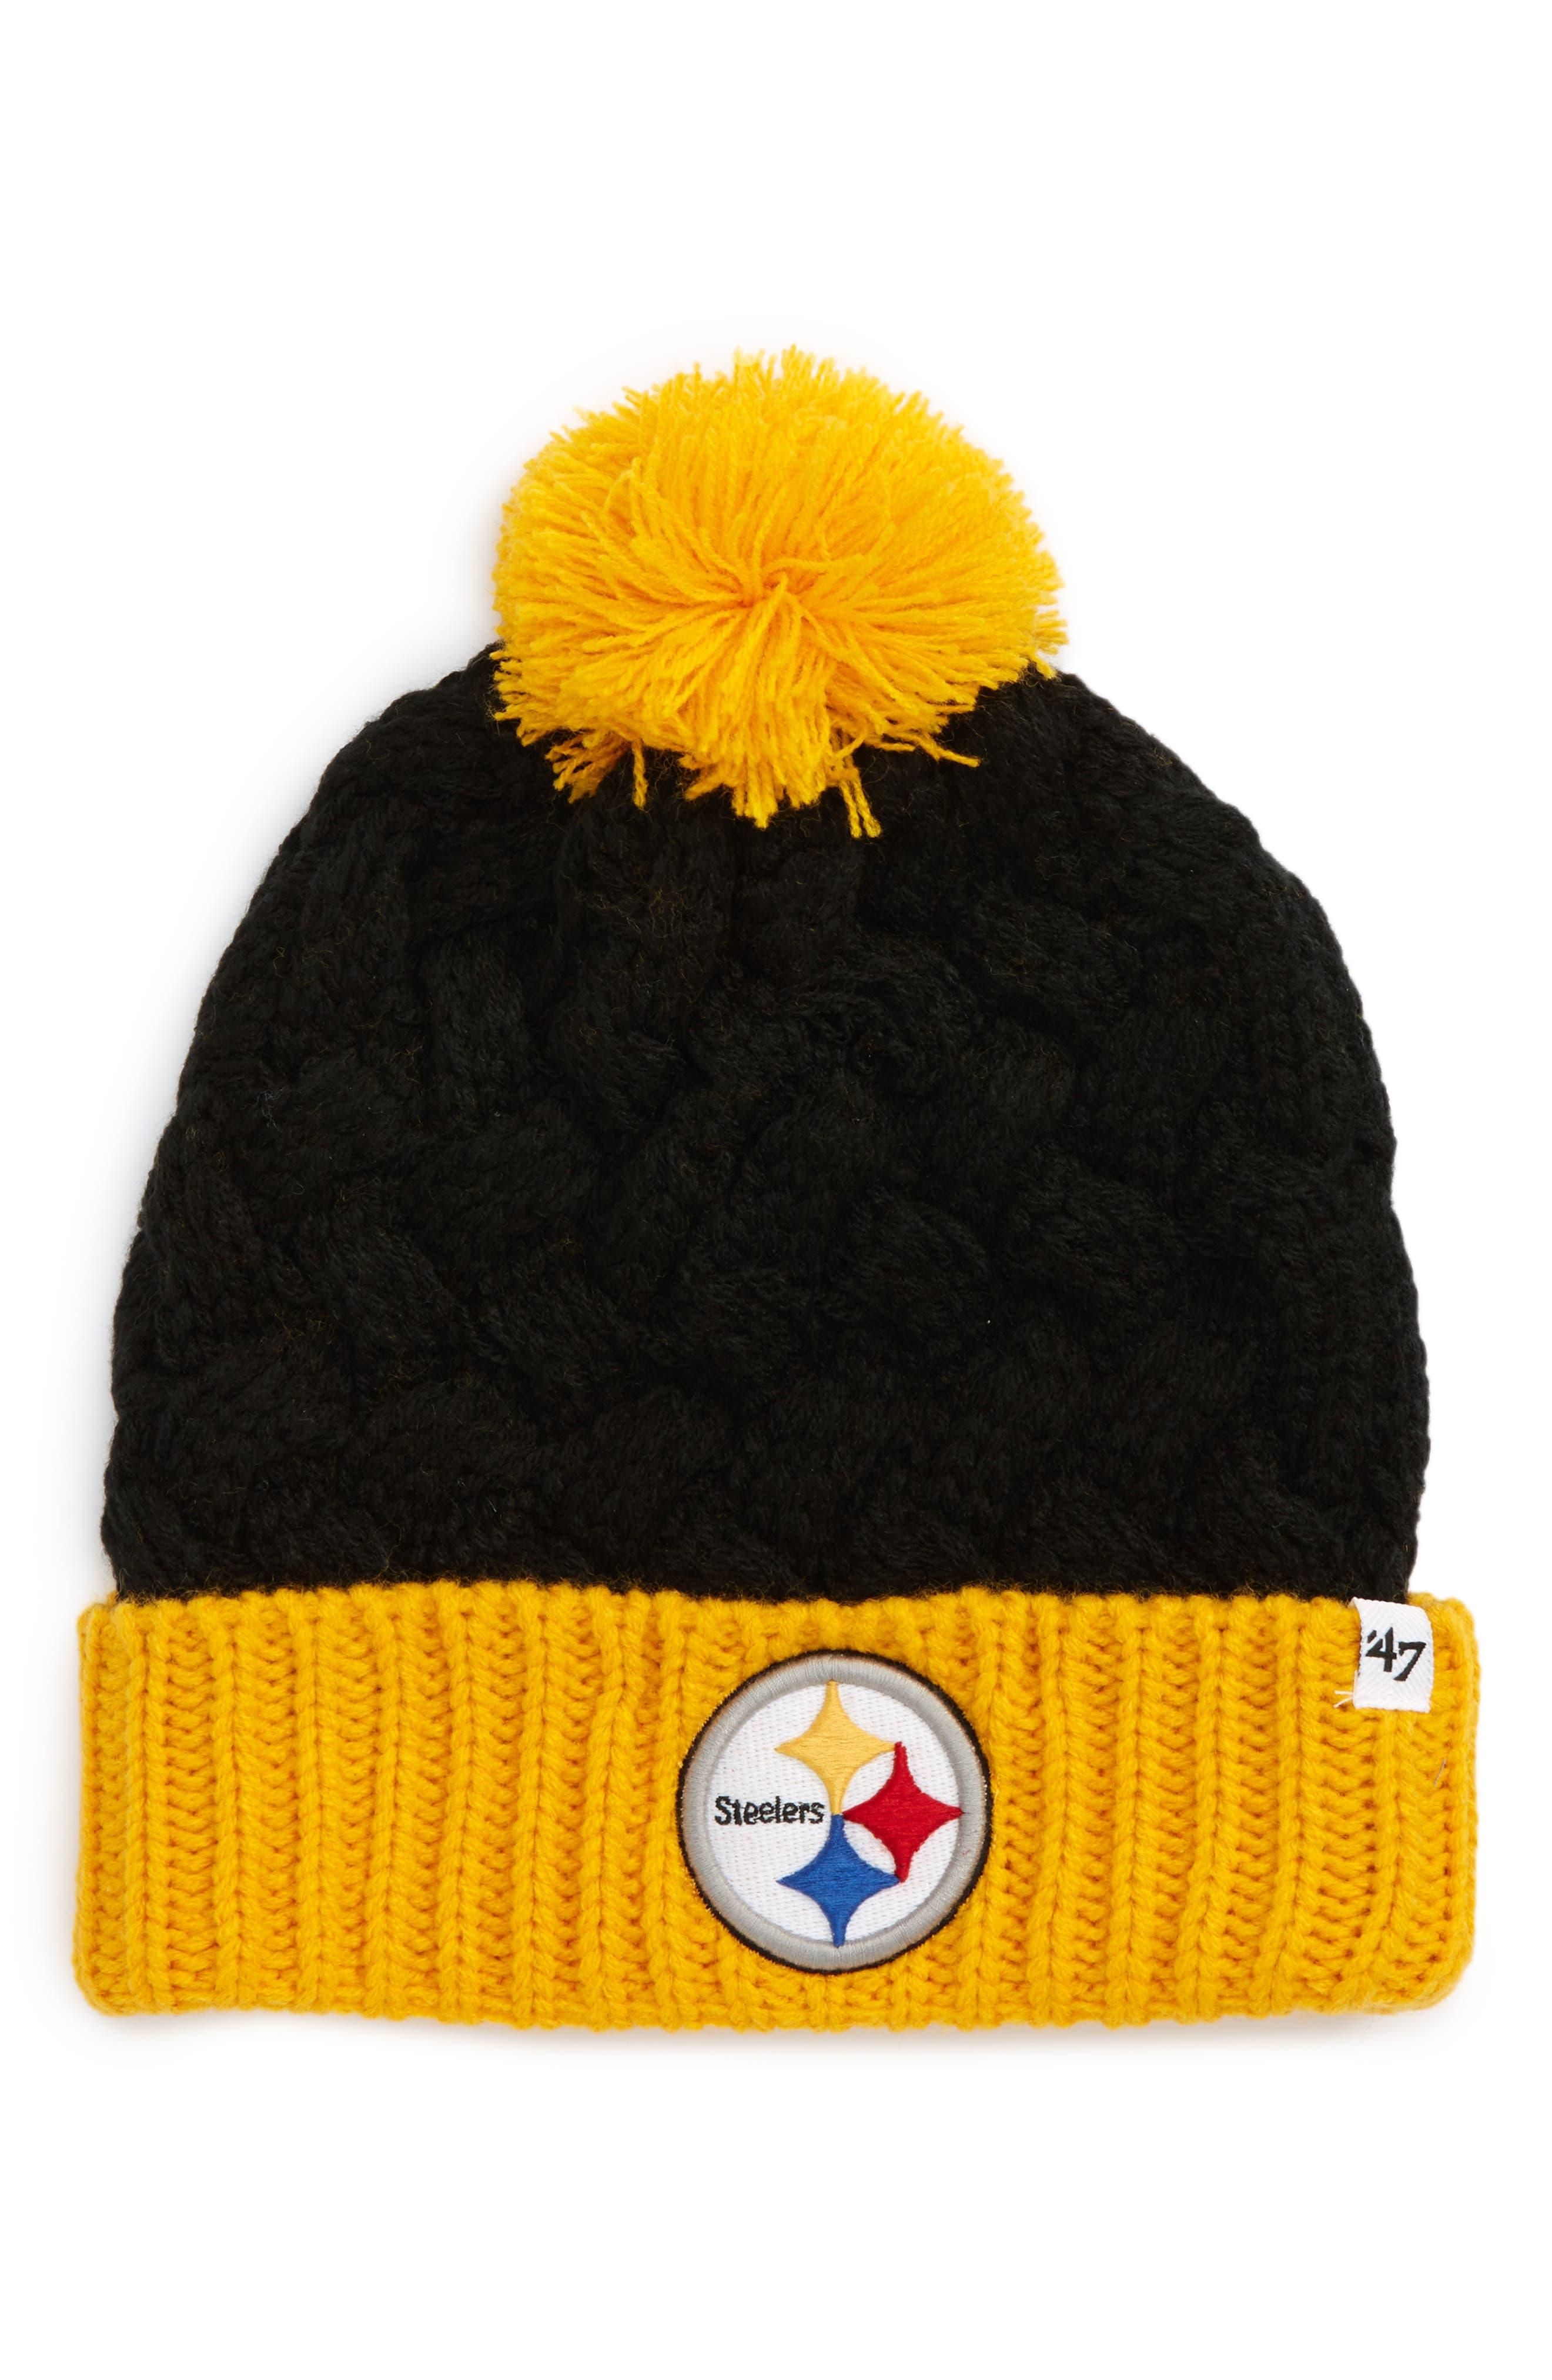 Matterhorn Pittsburgh Steelers Beanie,                         Main,                         color, 001